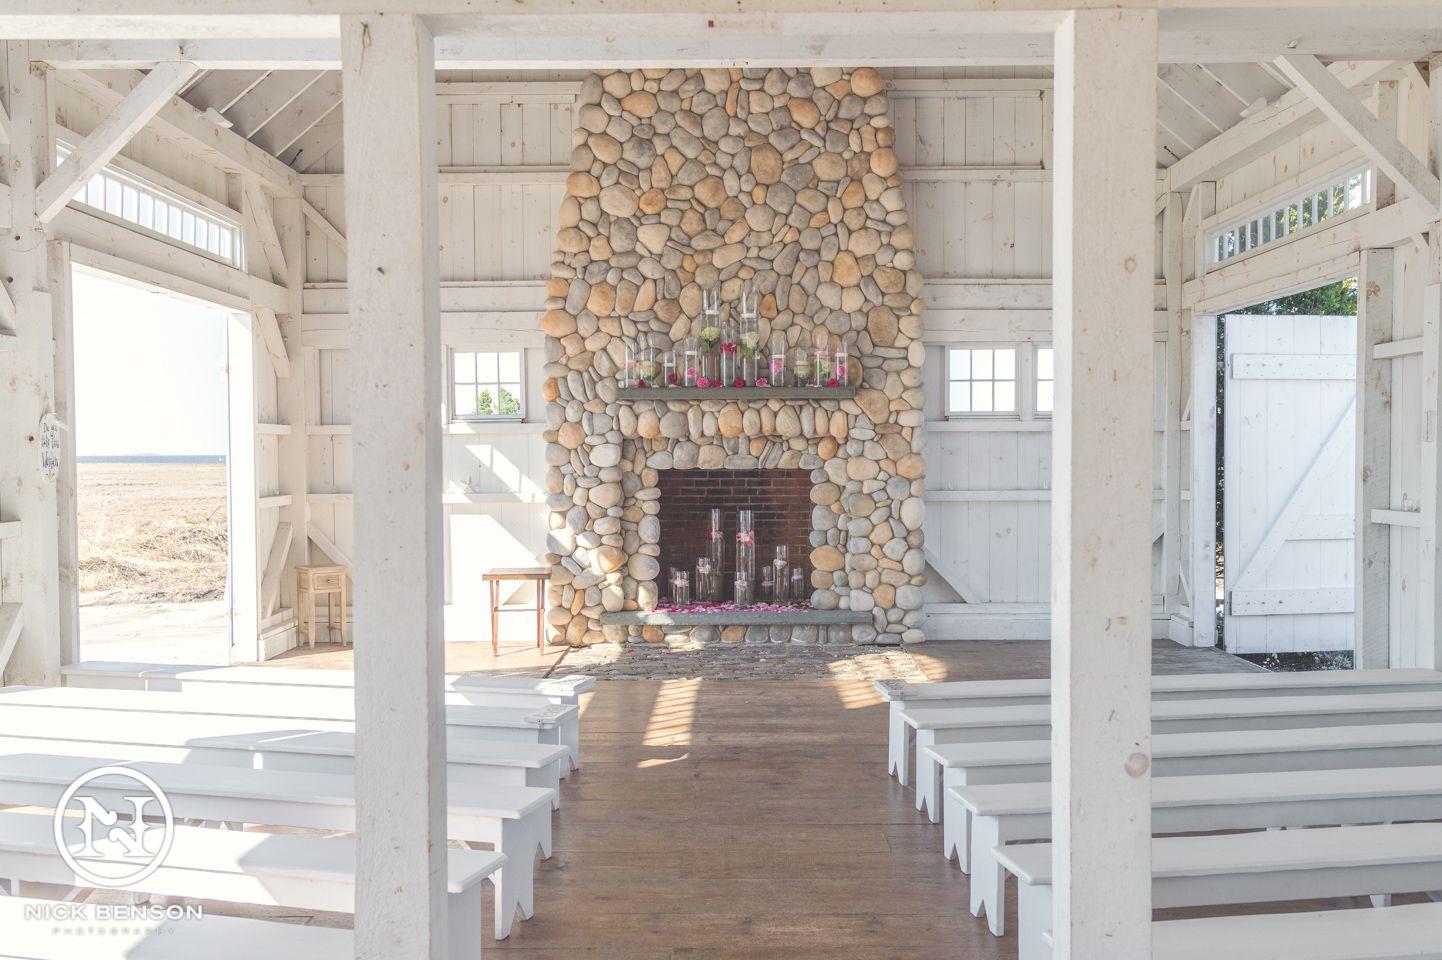 lbi beach theme wedding inside the chapel at bonnet island